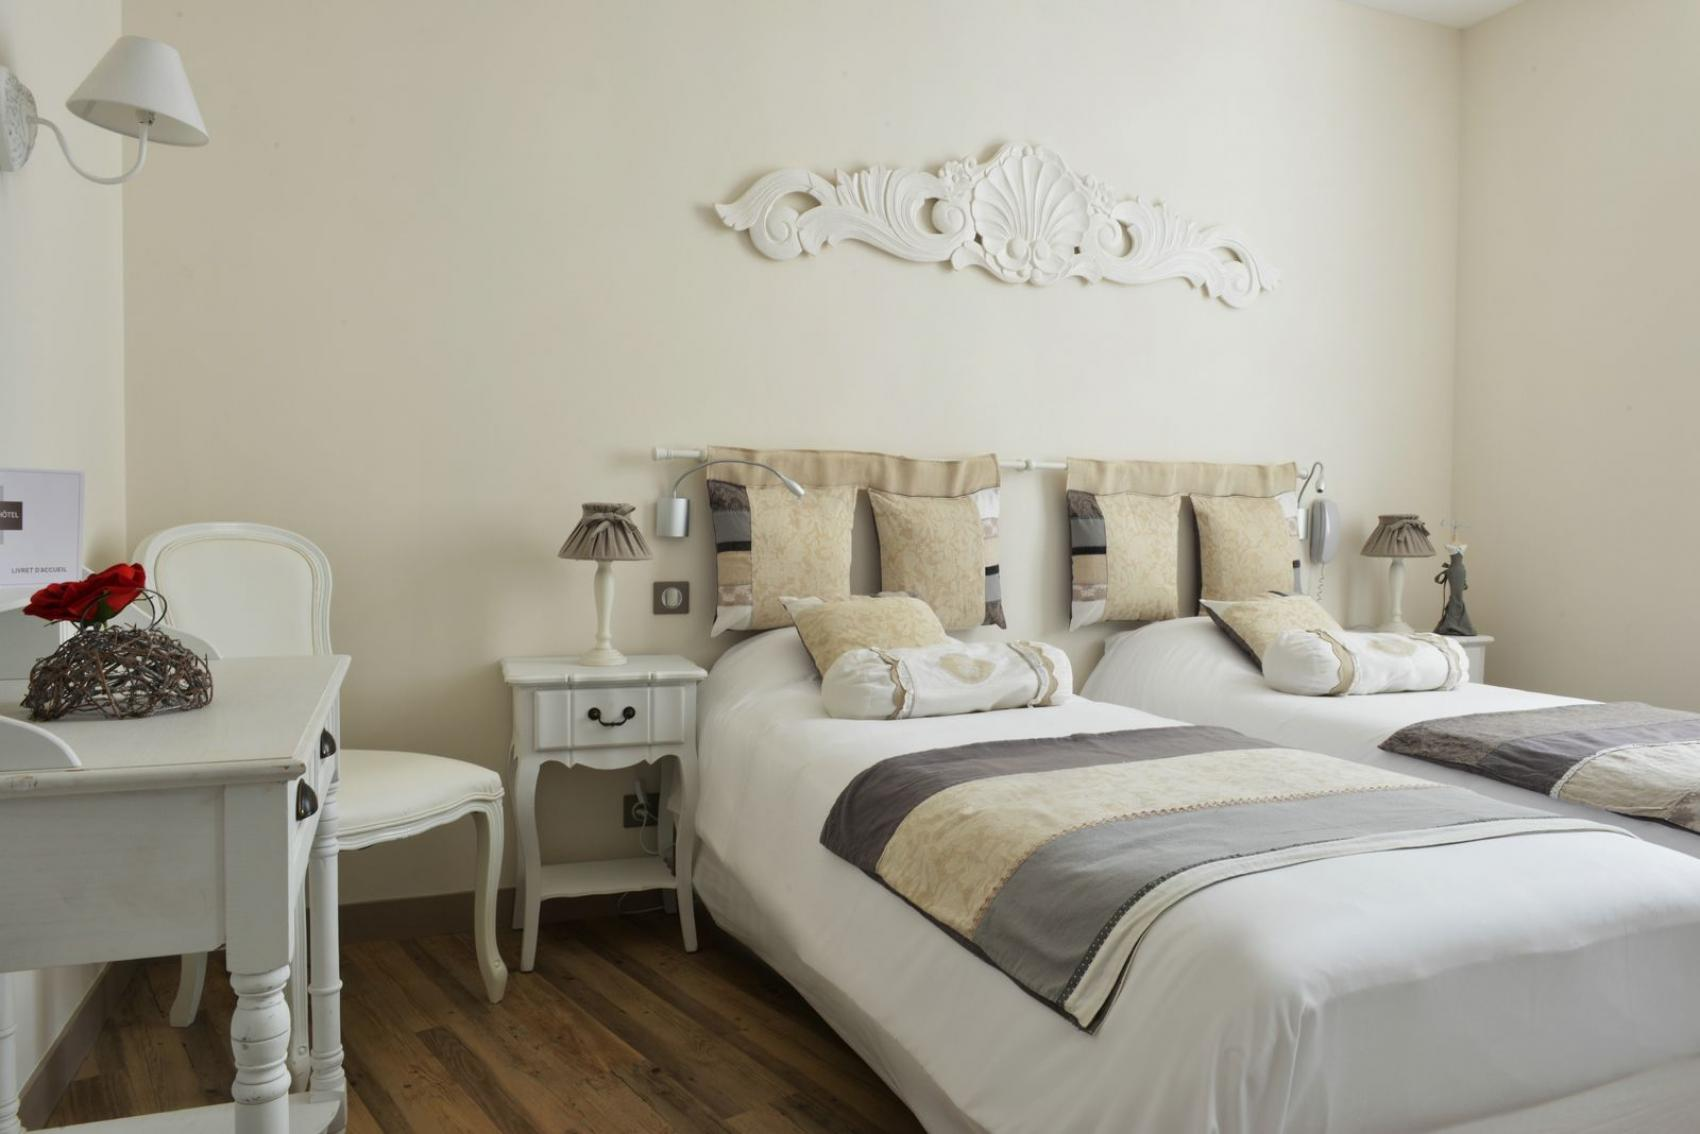 Chambres d 39 h tel fouras charente maritime grand for Hotel fouras grand hotel des bains